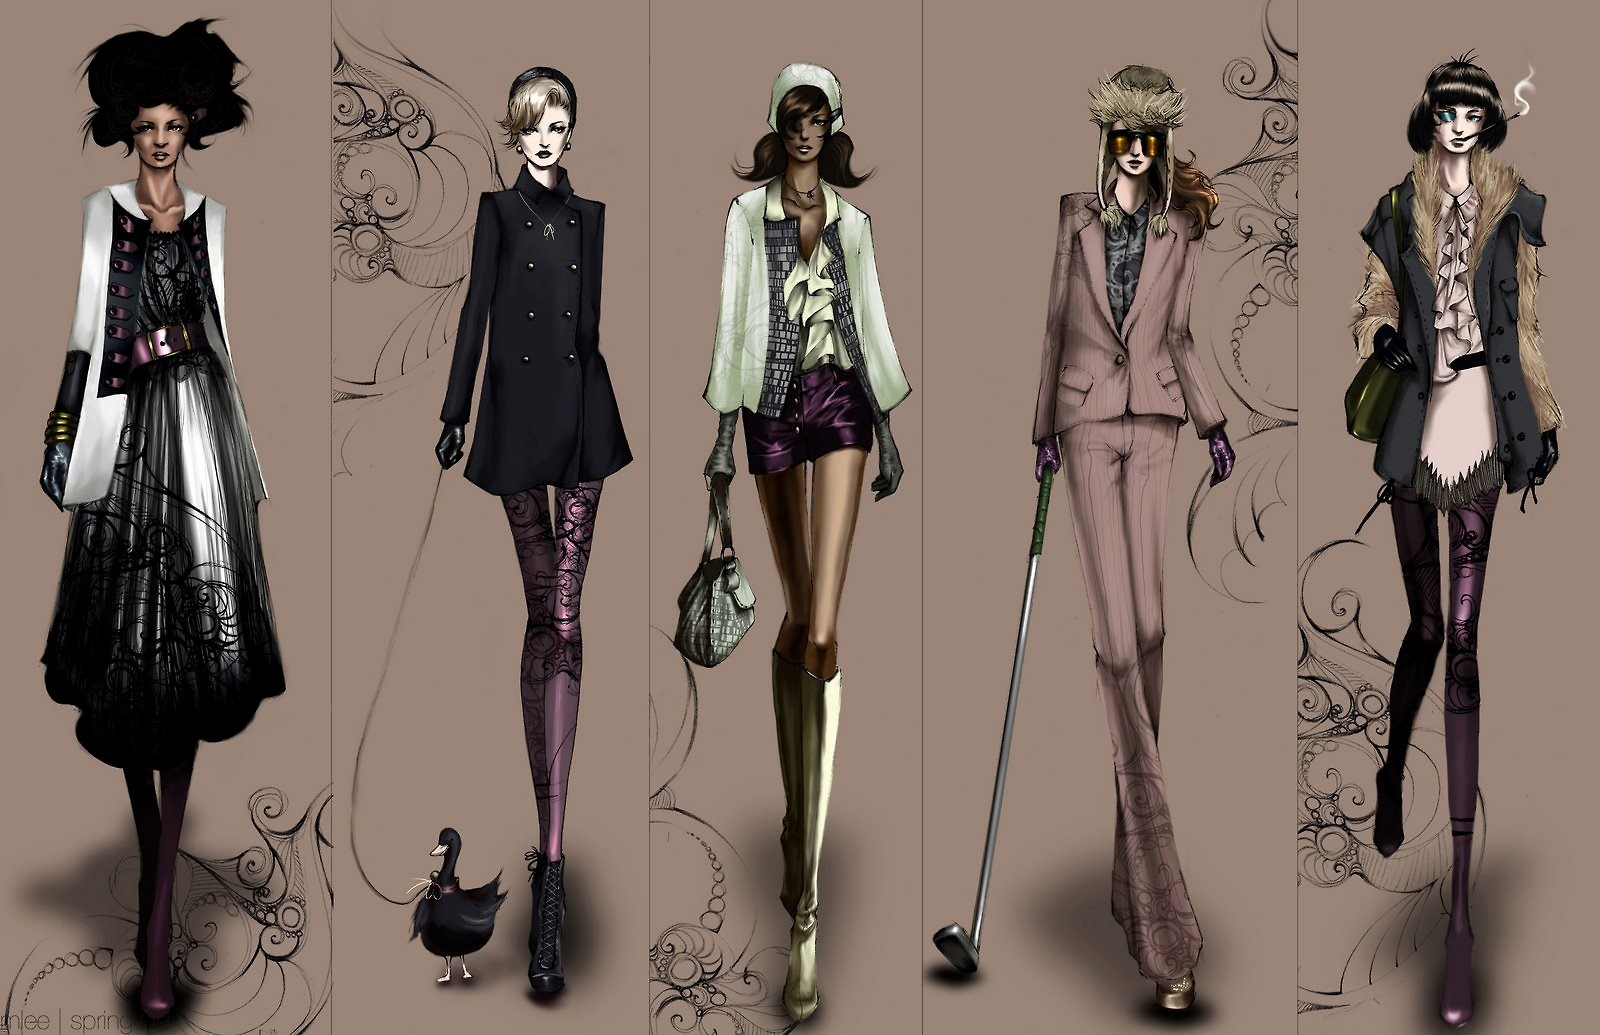 Fashion illustration of Contemporary Women